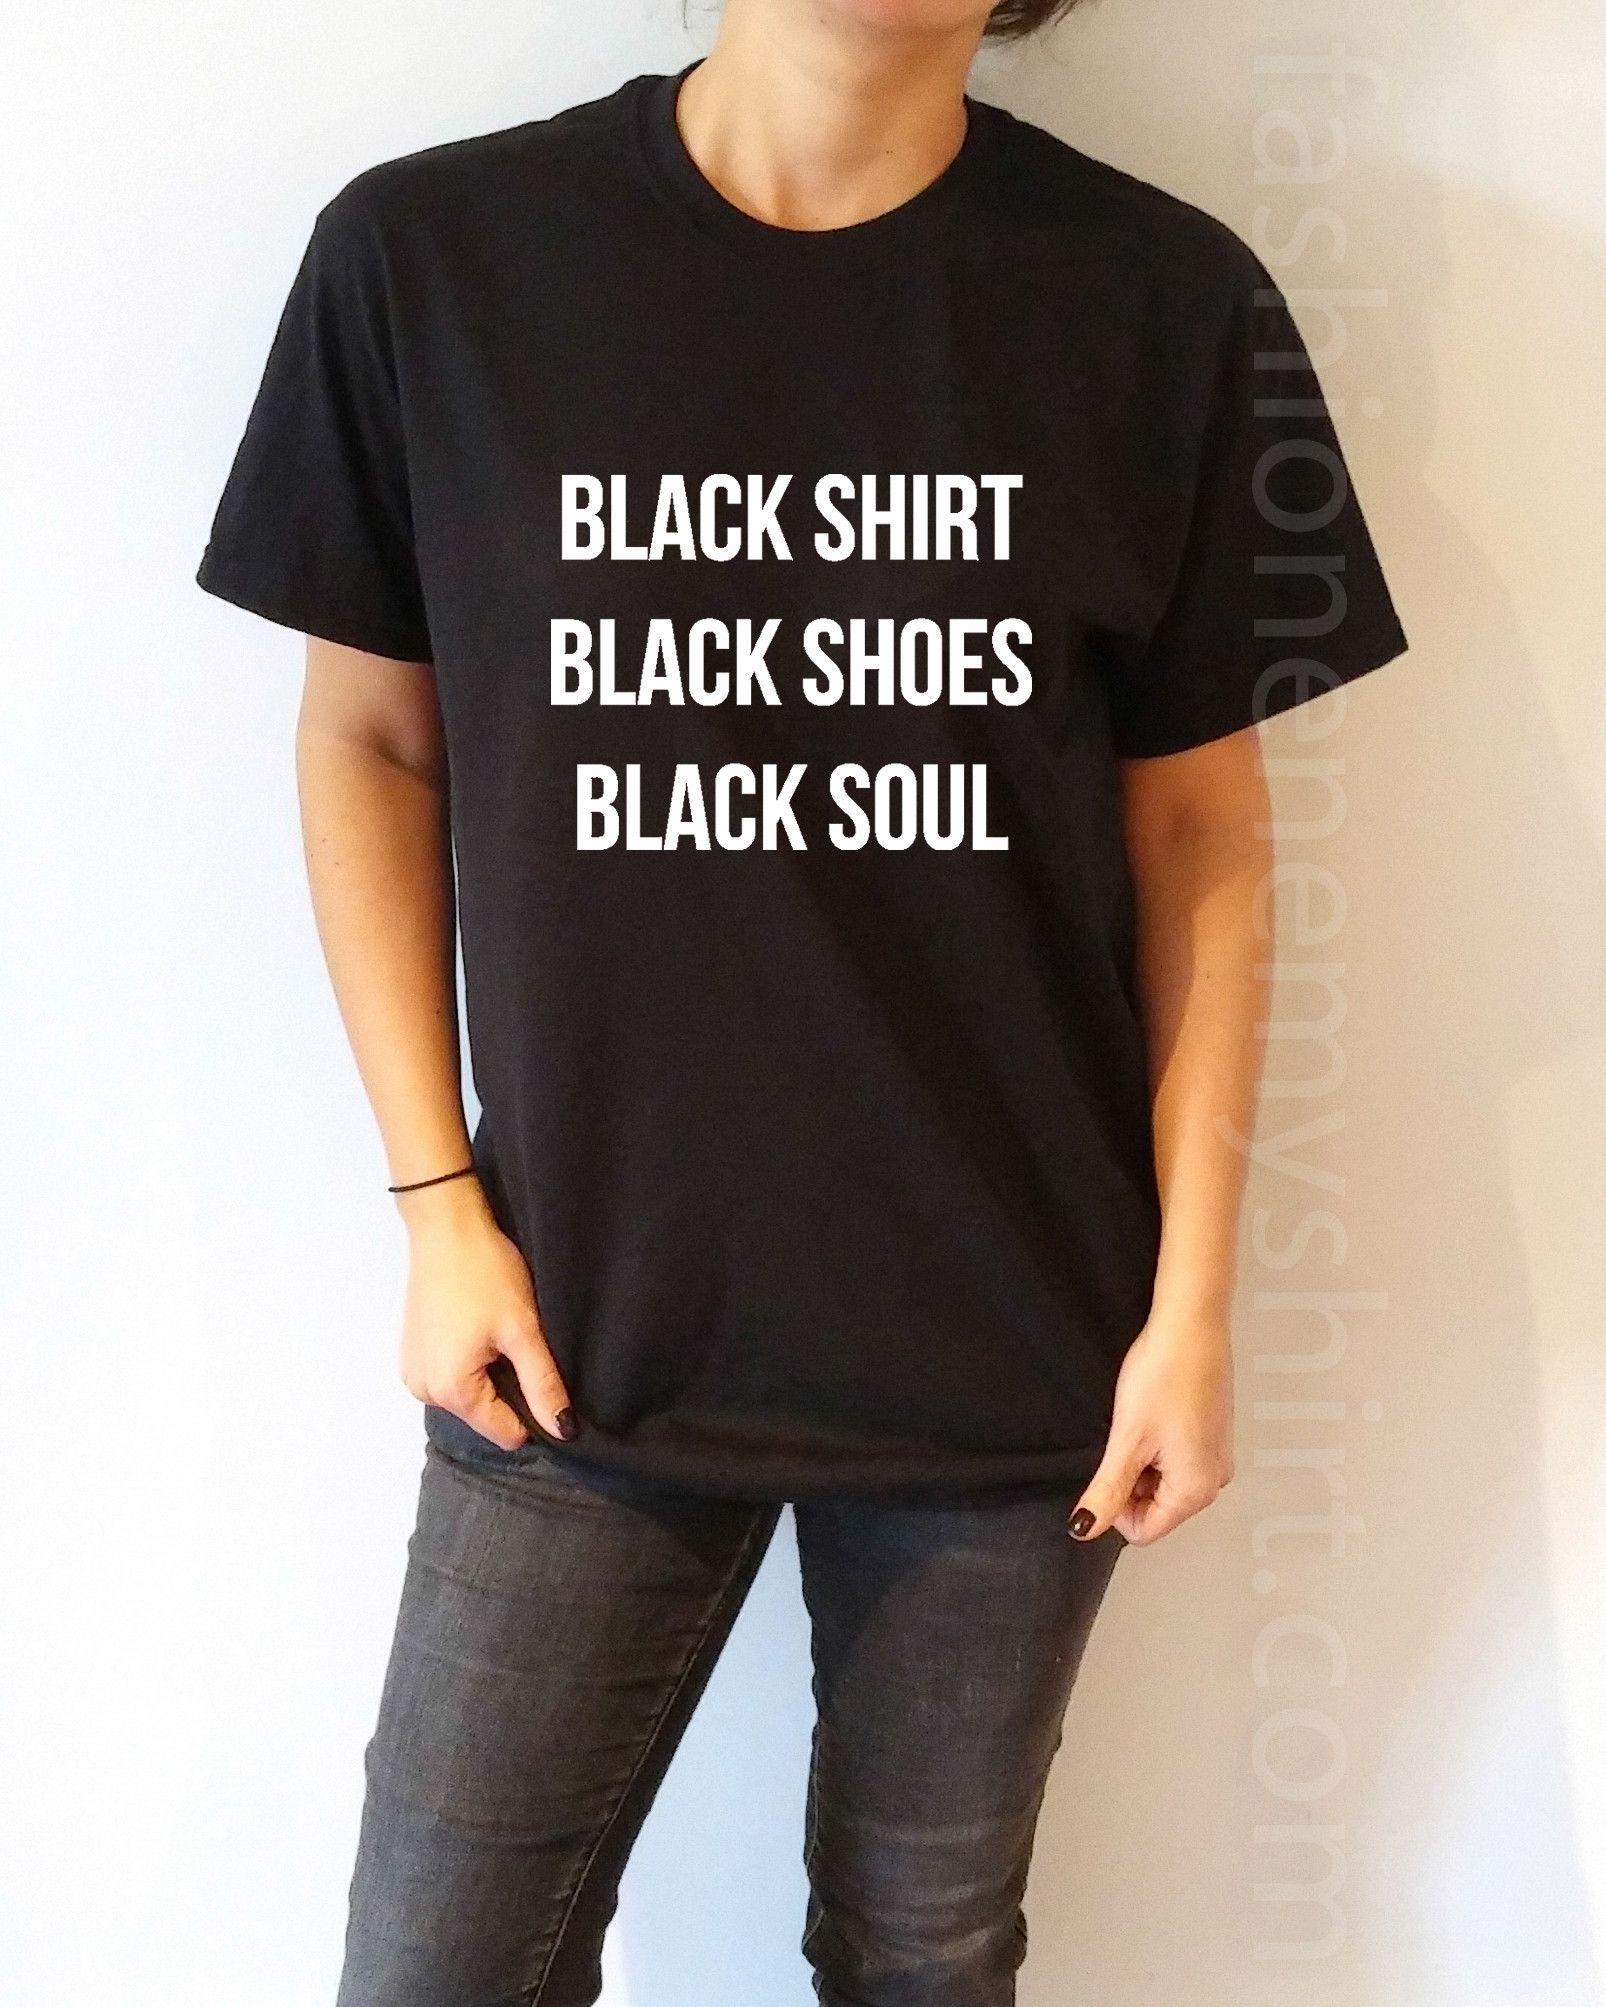 Black Shirt Black Shoes Black Soul - Unisex T-shirt for Women ...